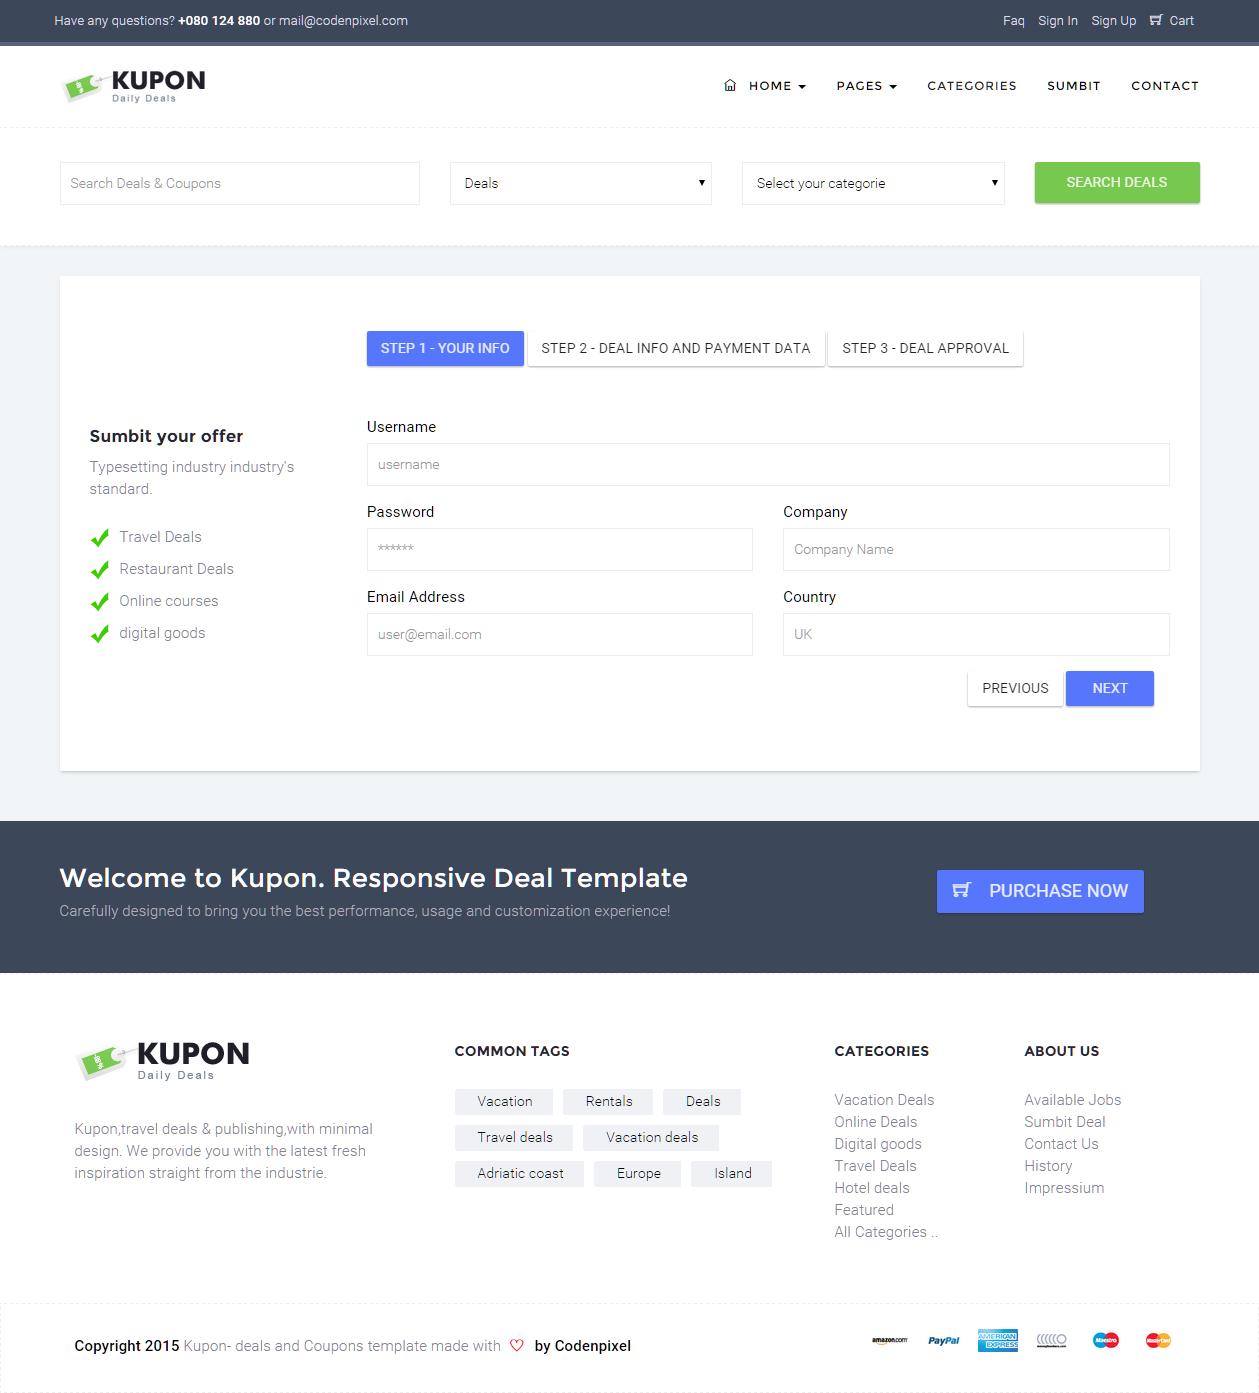 Kupon Deals Discounts Material Design